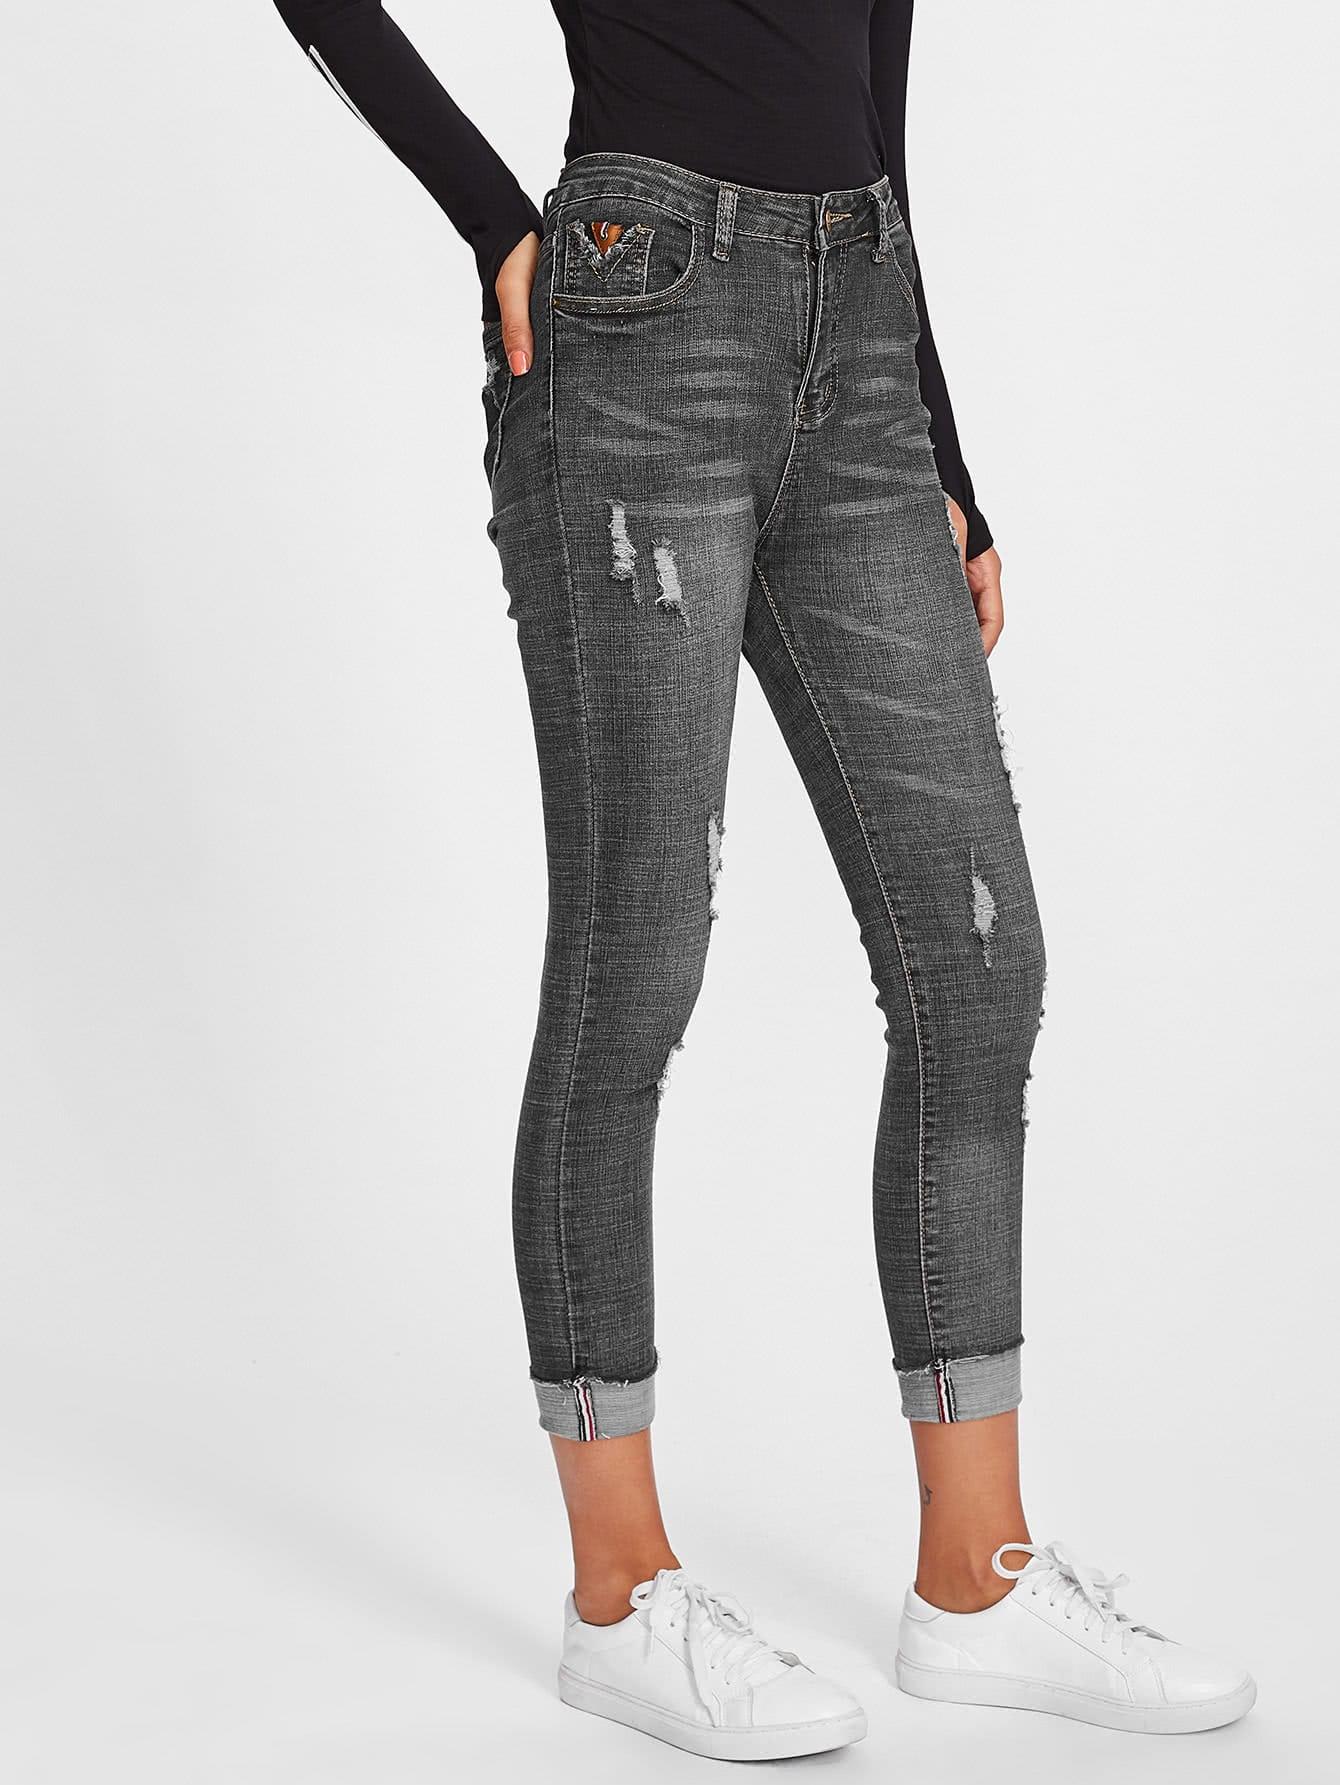 Roll Hem Ripped Jeans